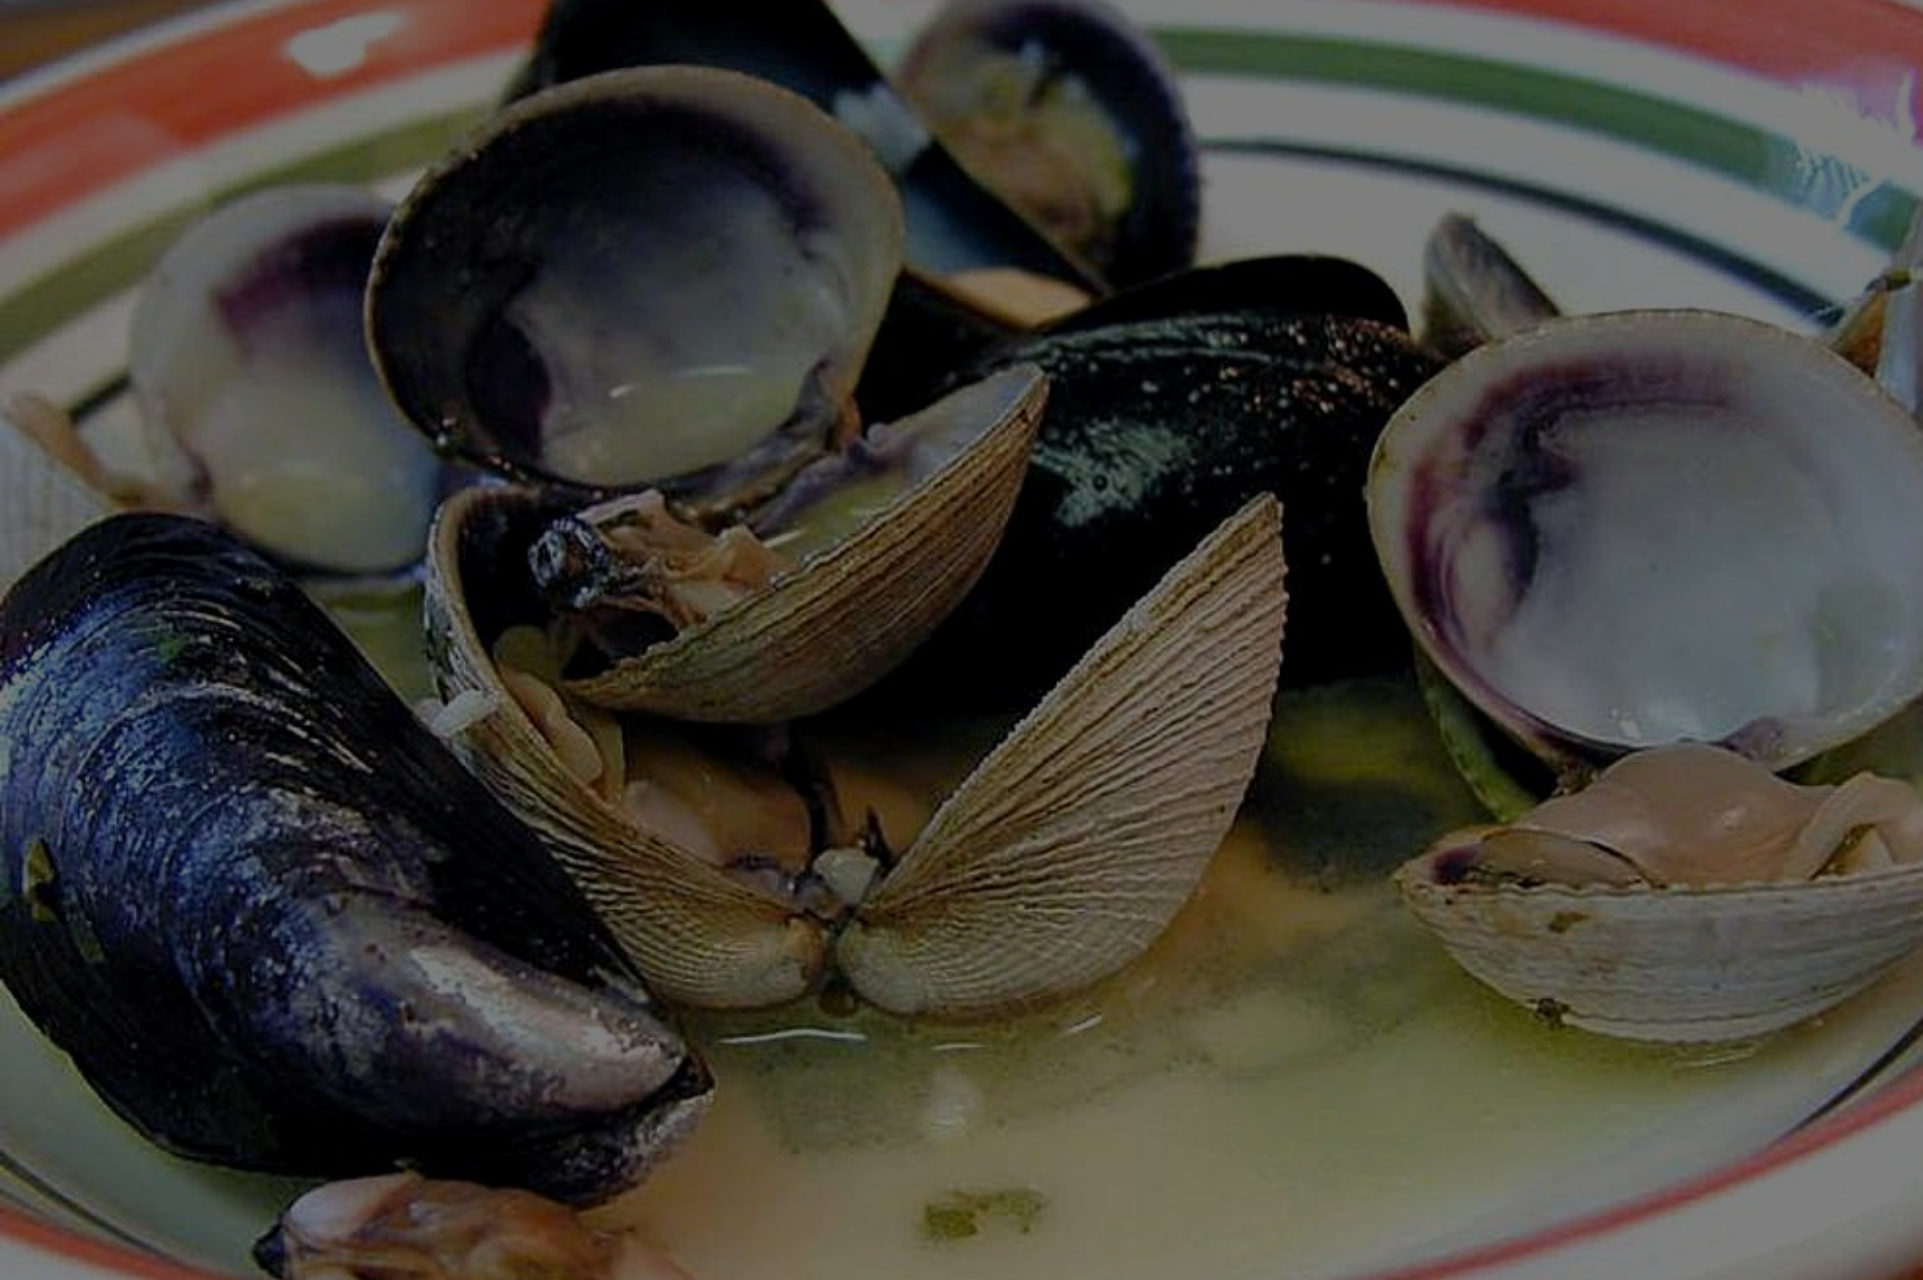 Shellfish Food Fraud Man Given Suspended Jail Sentence